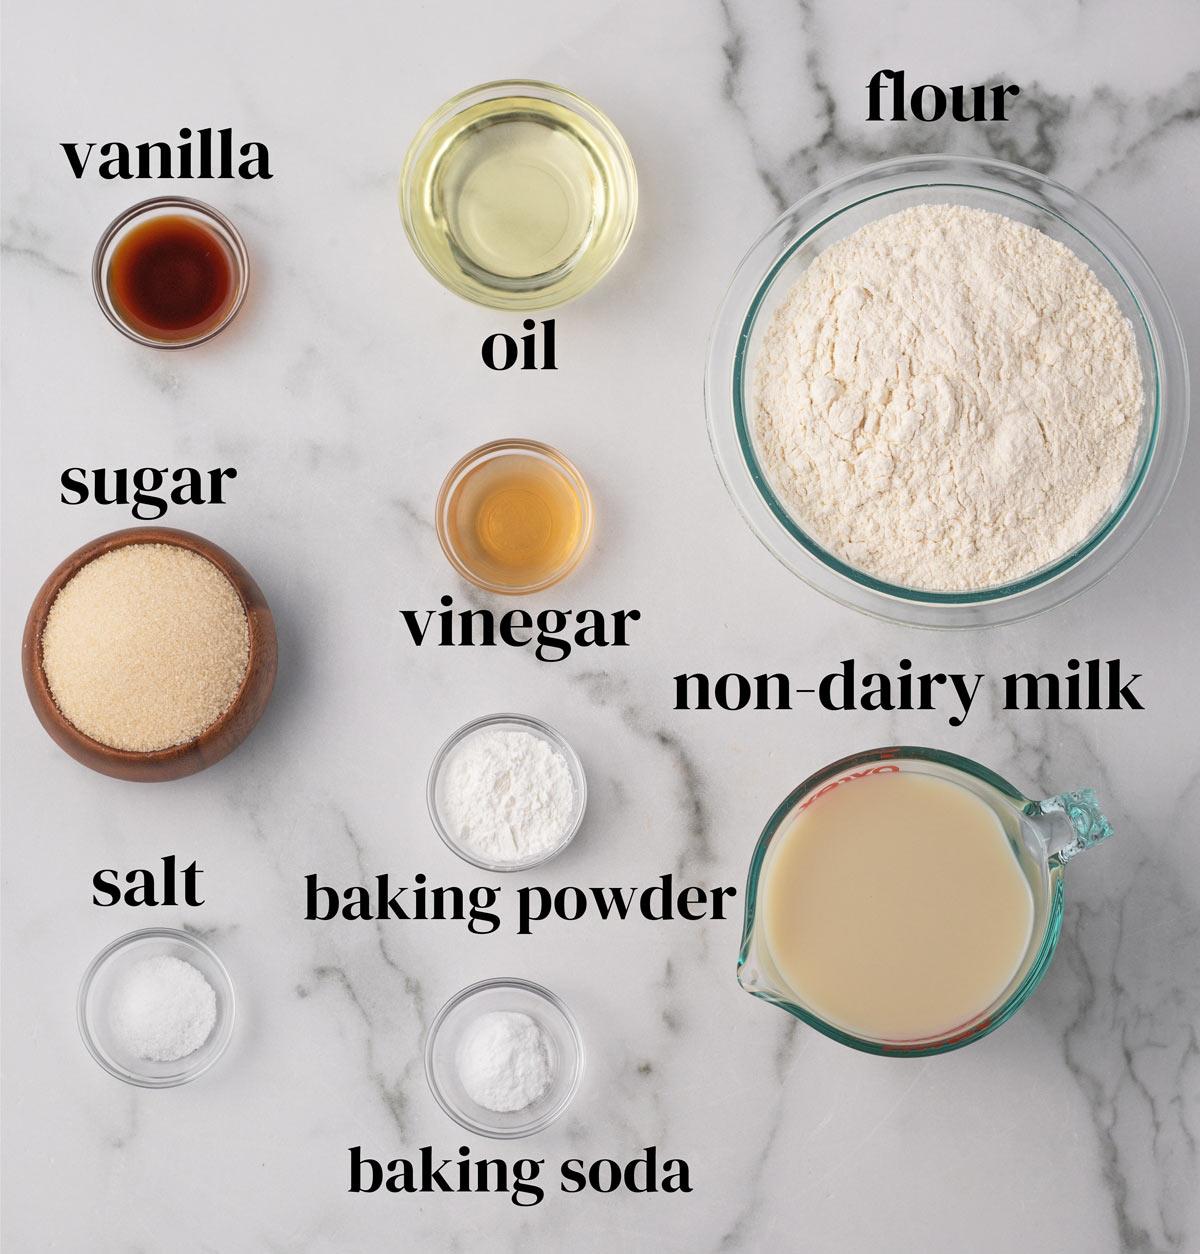 overhead of all of the ingredients for vegan vanilla cake: flour, milk, sugar, vinegar, vanilla